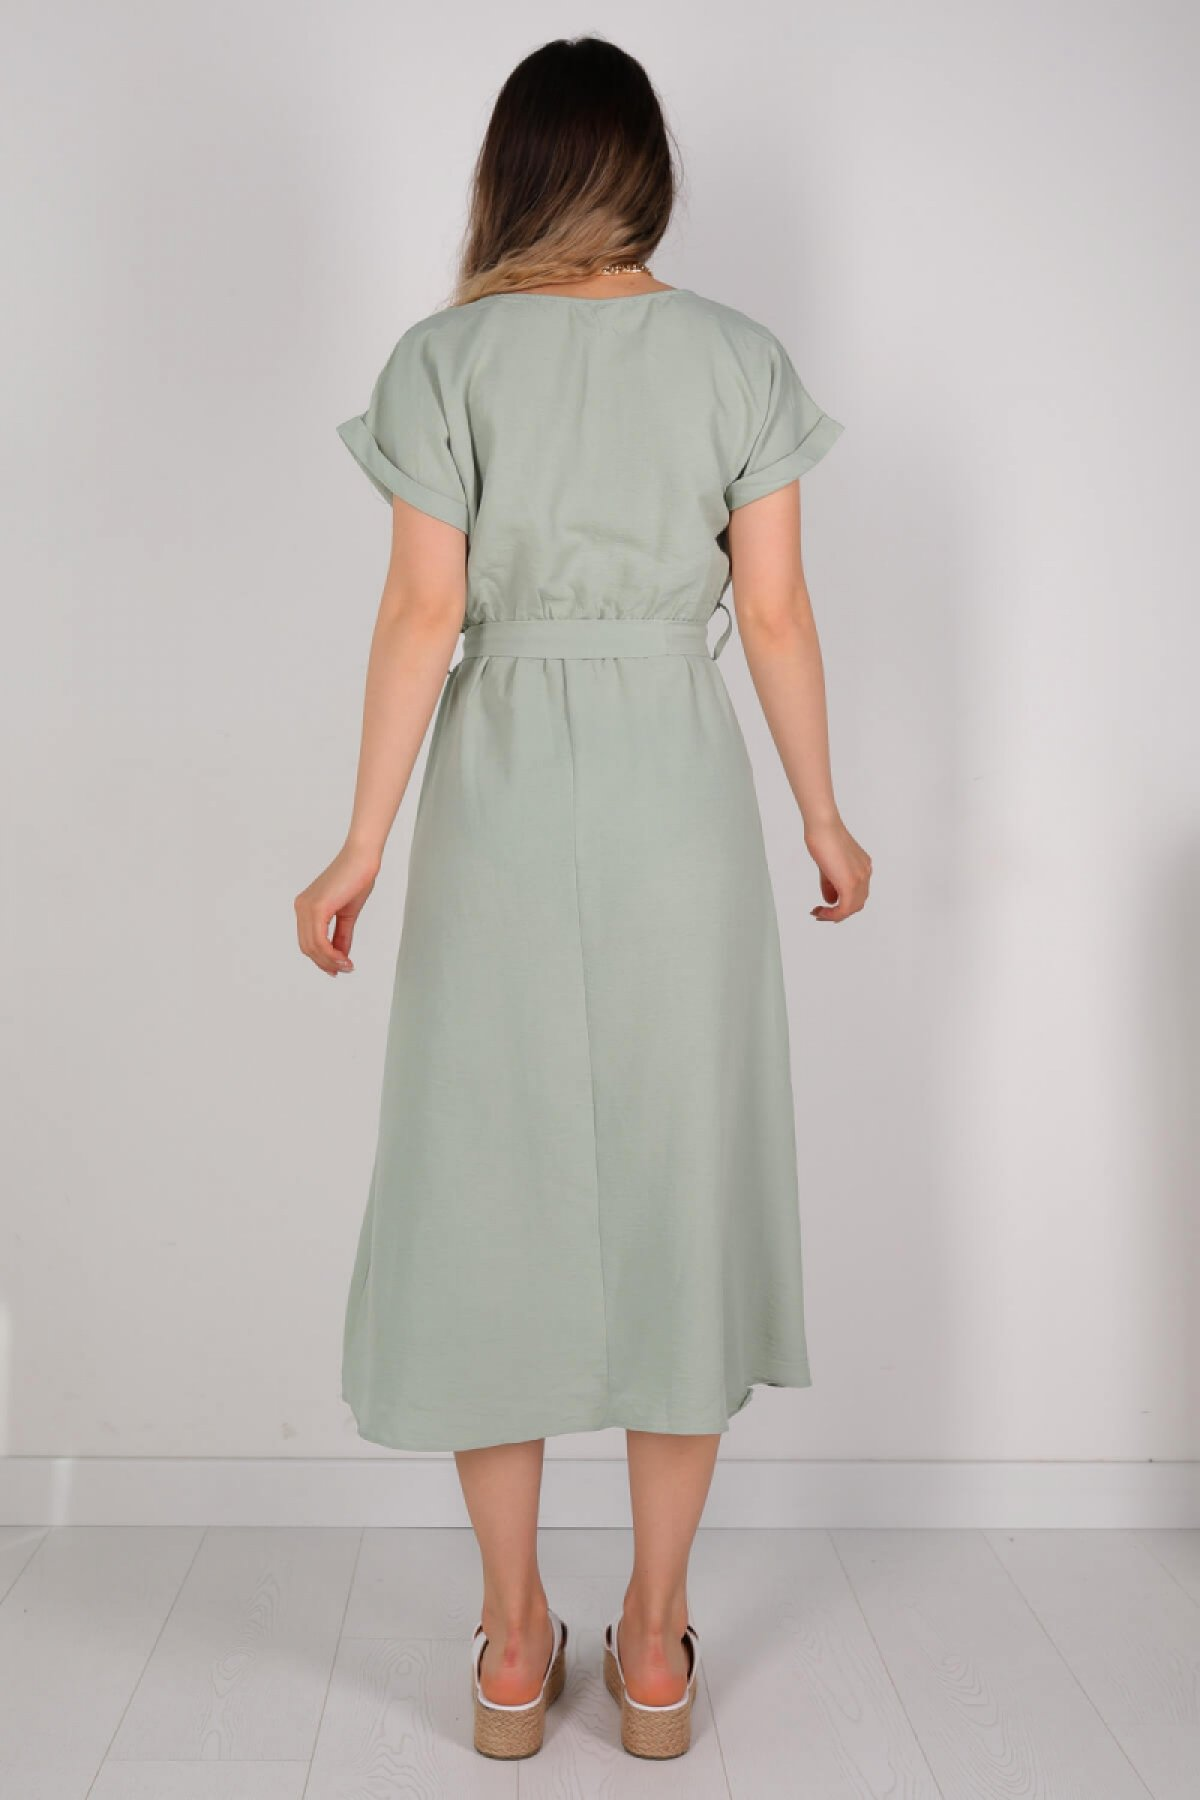 Women's Belted Mint Green A...